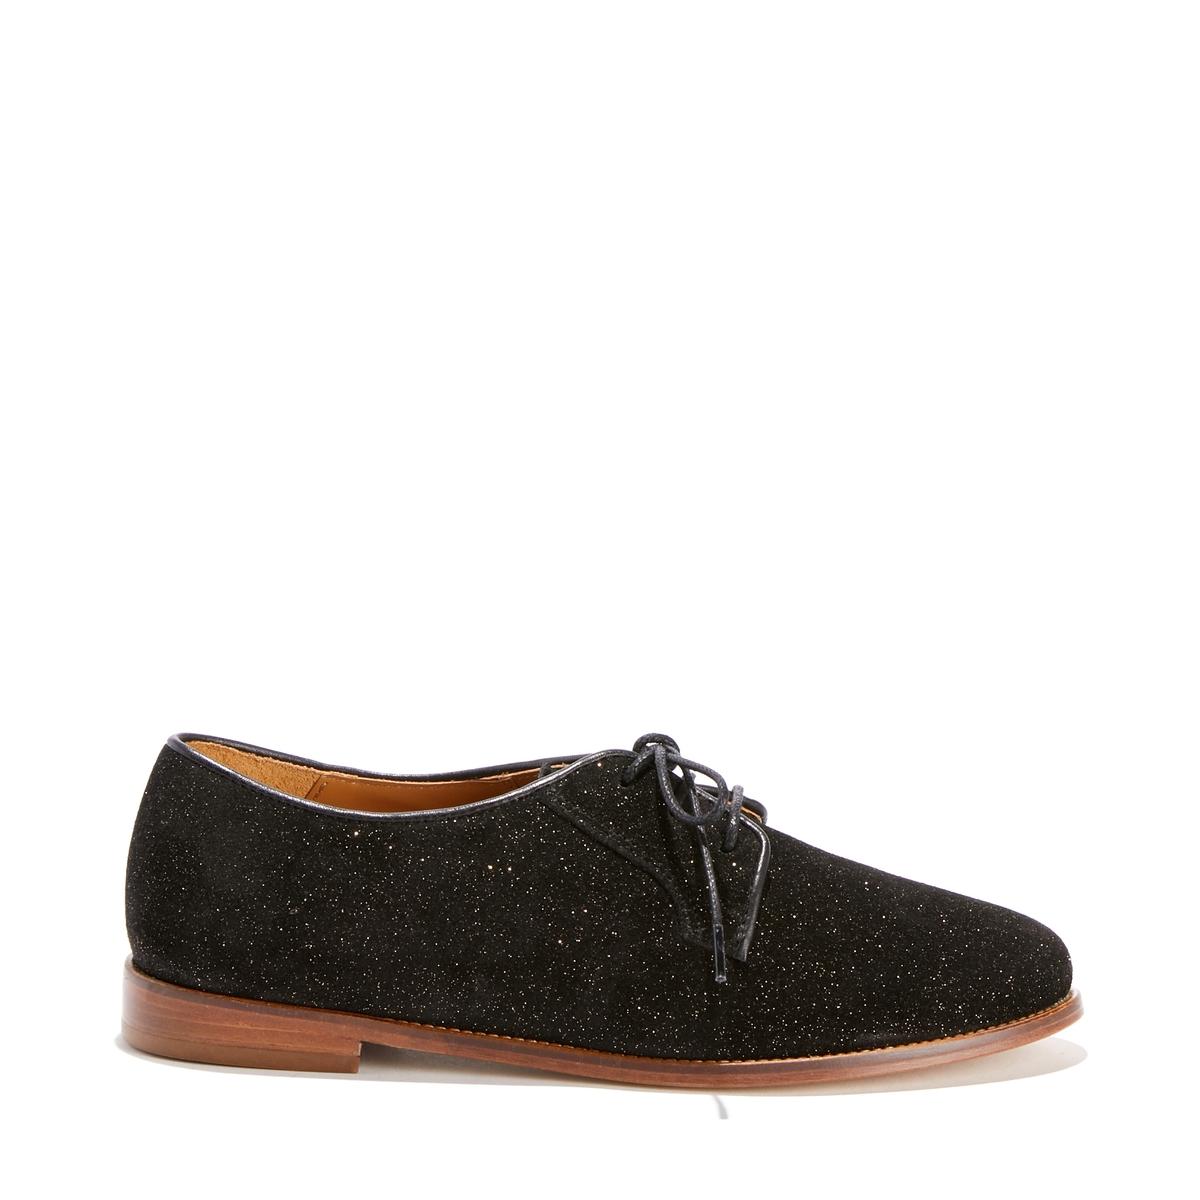 Ботинки-дерби кожаные с пайетками цены онлайн